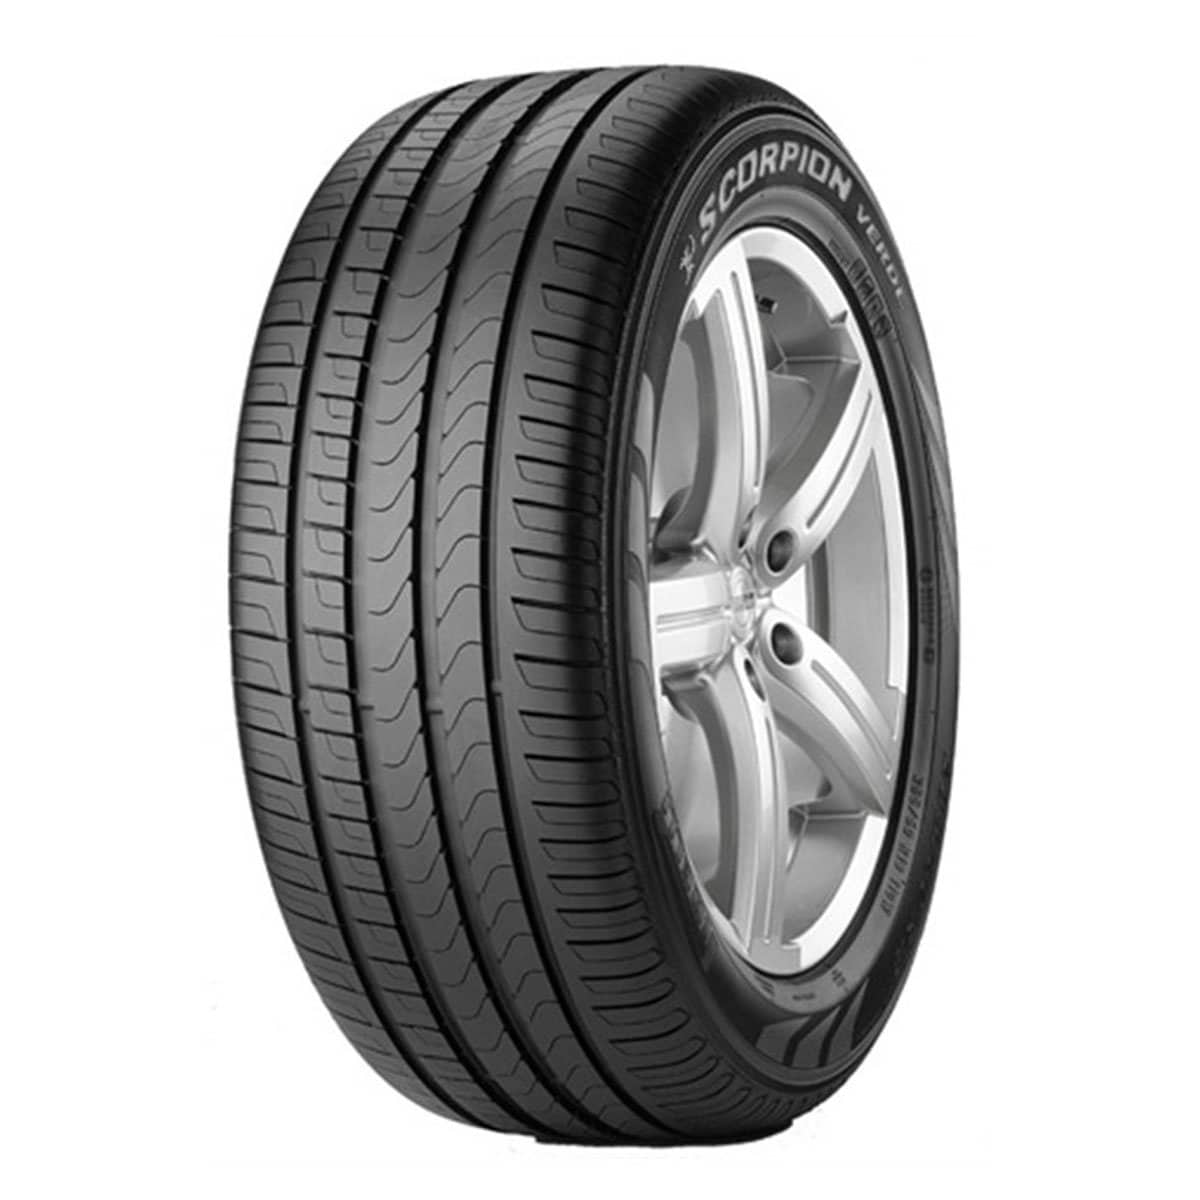 Spllanta 255 55 R20 Scorpion Verde 110Y Pirelli